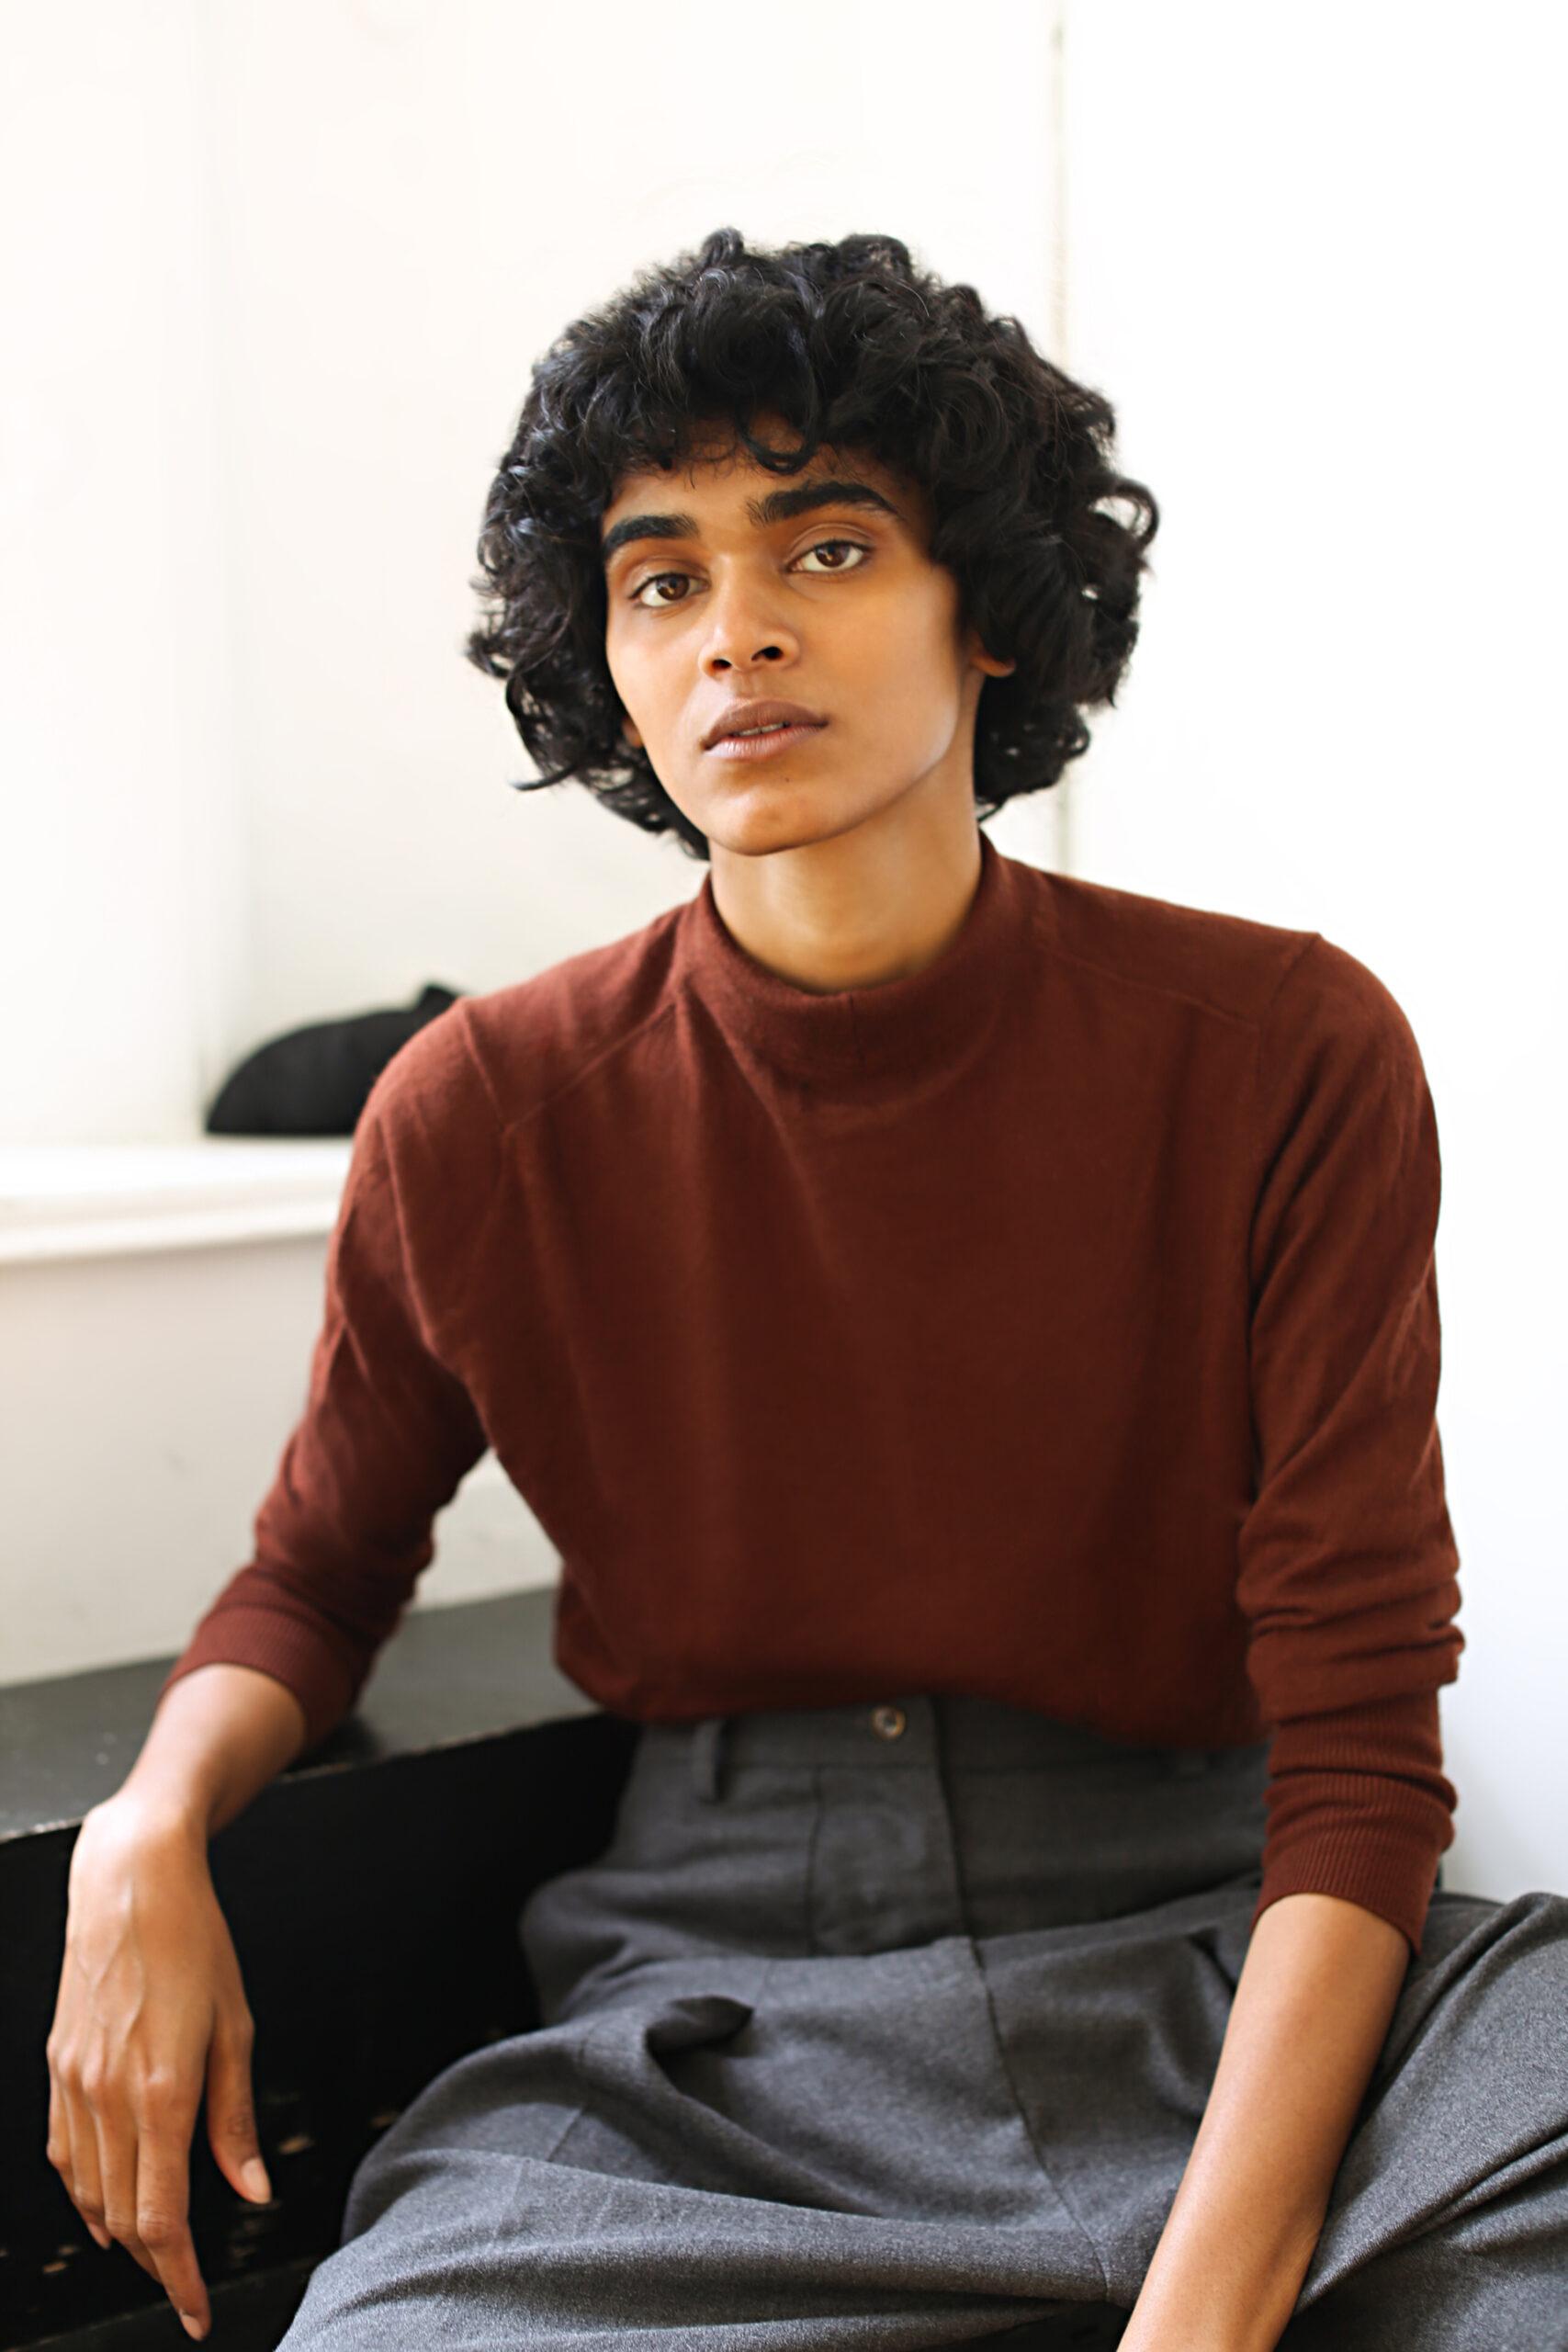 Paul Brickman Creative Photography Radhika Nair Ford Models Fashion Runway Editorial Burberry Mulberry